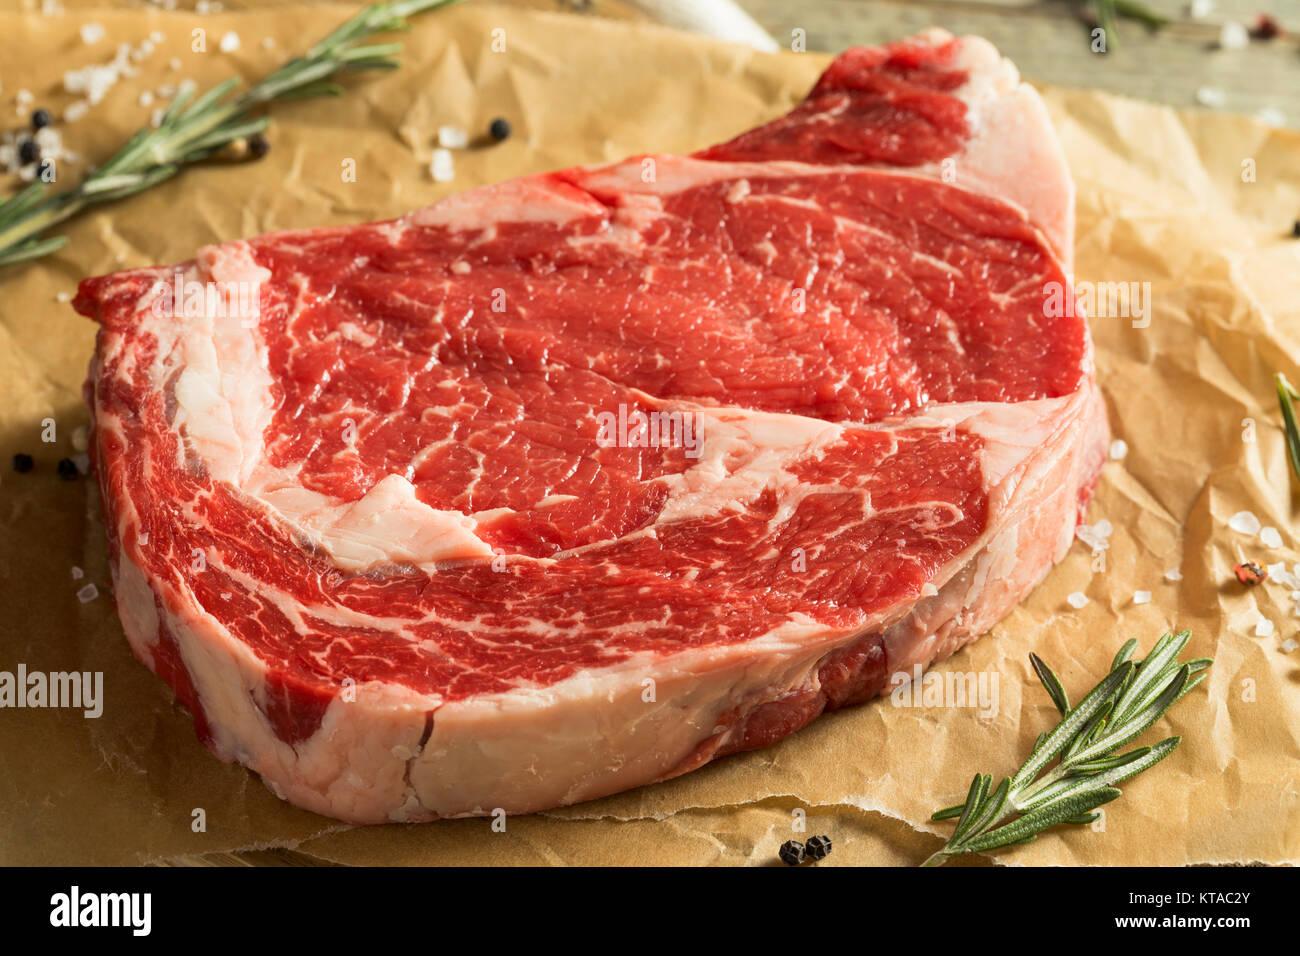 Raw Grass Fed Boneless Ribeye Steak Ready to Cook Stock Photo